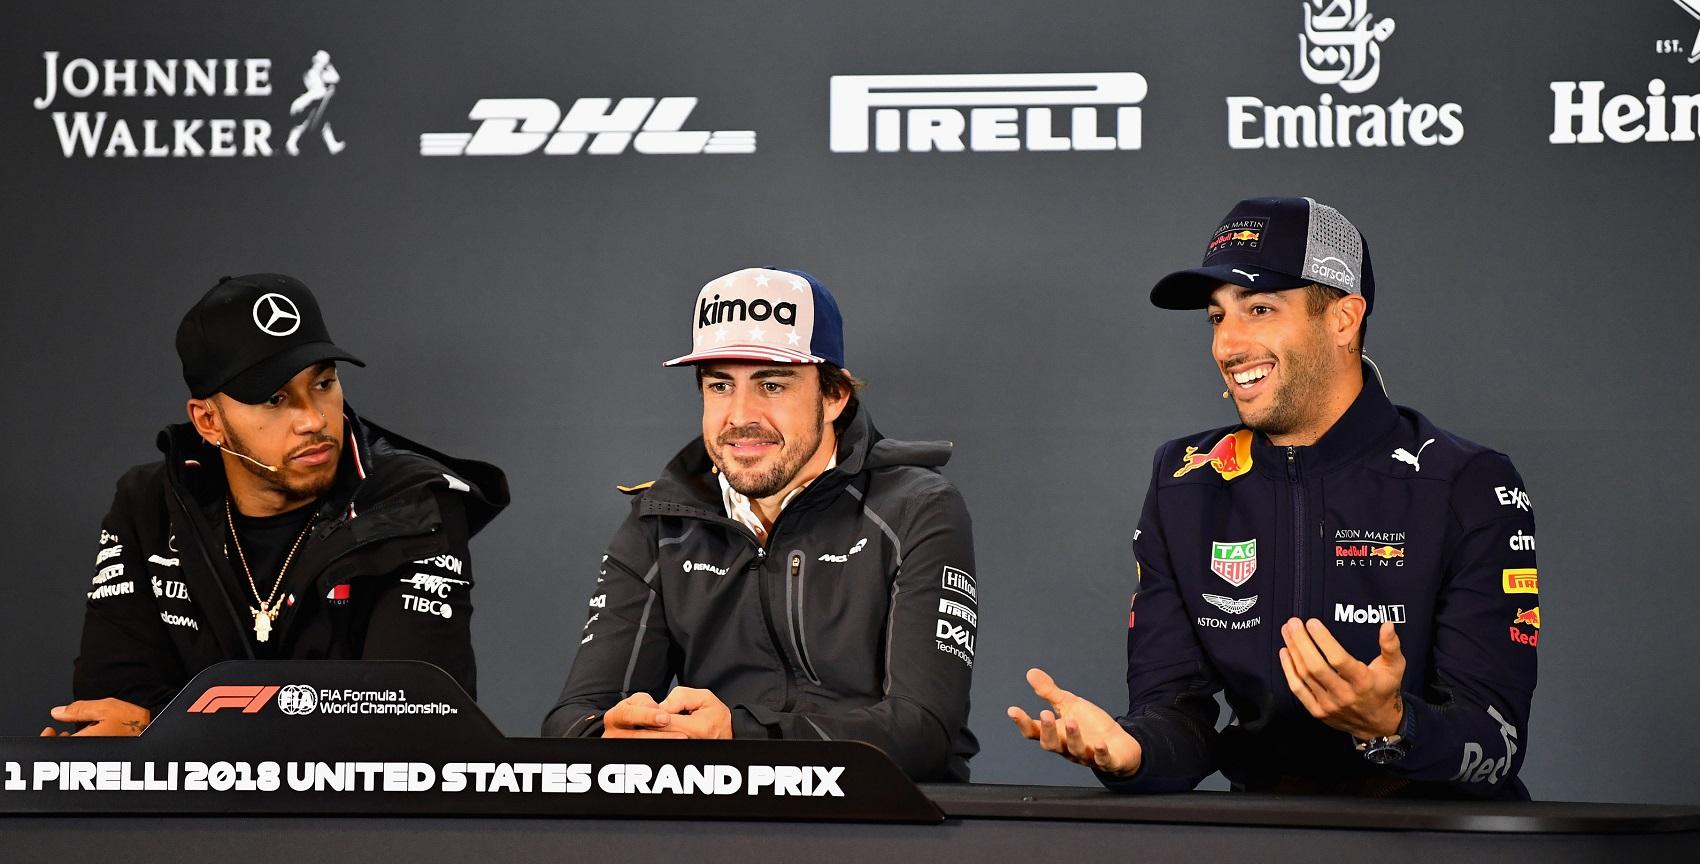 Lewis Hamilton, Fernando Alonso, Daniel Ricciardo, racingline, racinglinehu, racingline.hu